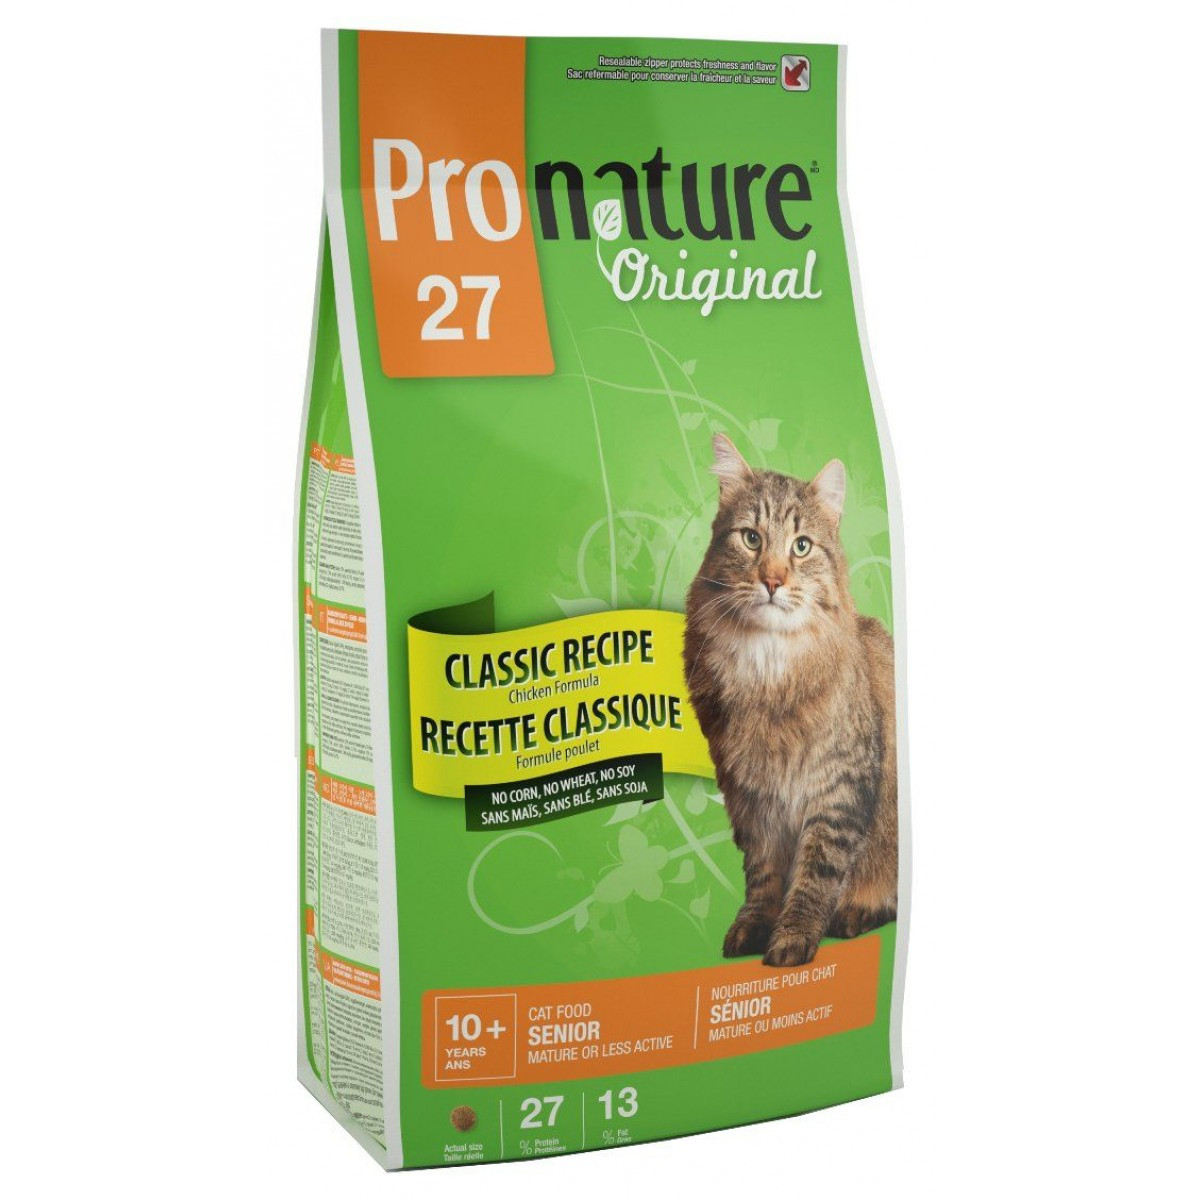 Pronature Original (Пронатюр) Cat SENIOR 2.72кг - корм для стареющих кошек от 10 лет